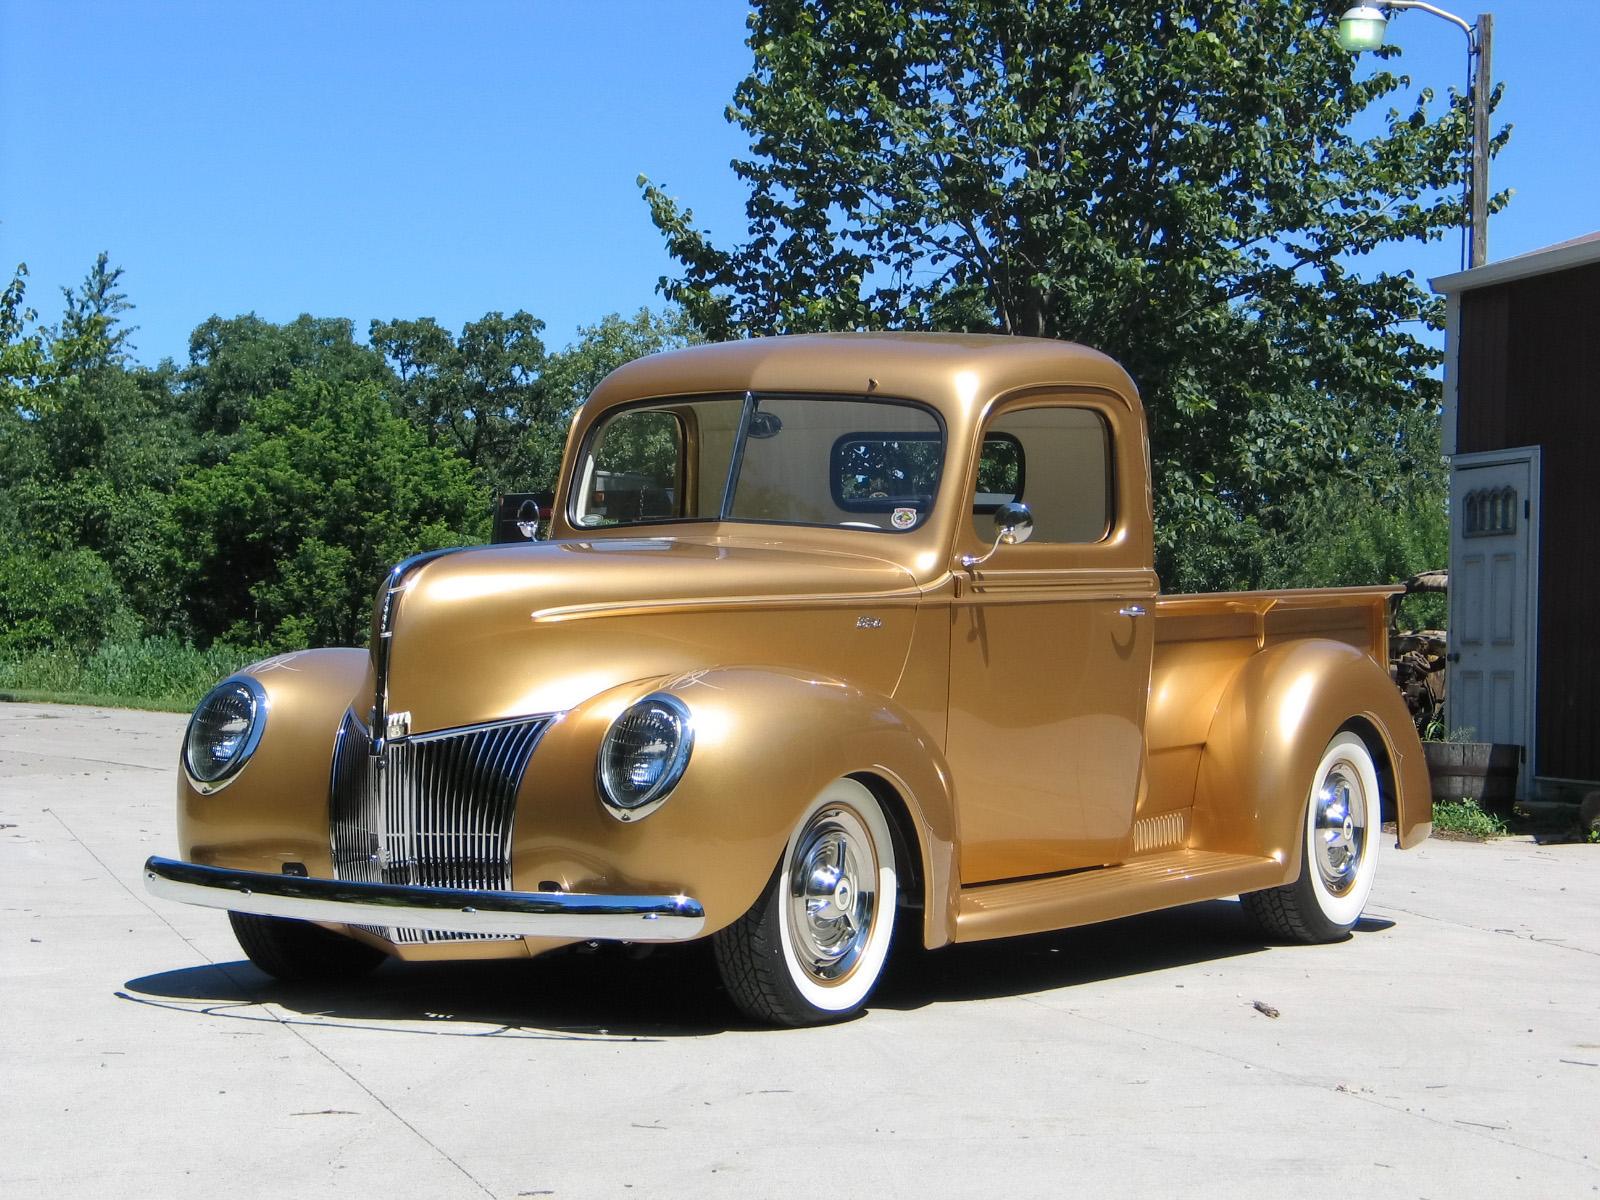 Ford Pickup truck retro hot rod rods lowrider lowriders f wallpaper 1600x1200